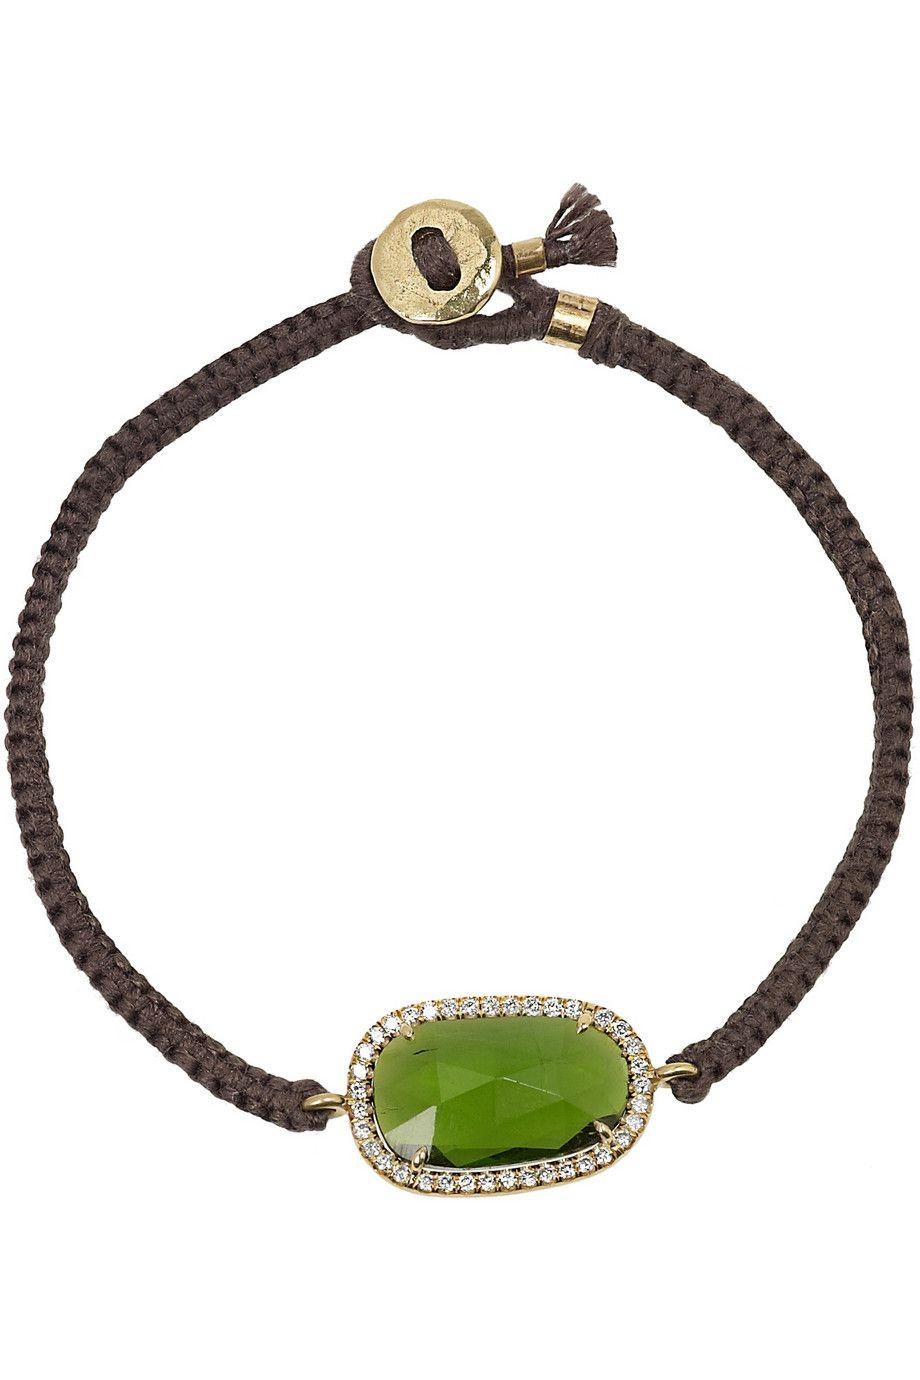 Karat gold tourmaline and diamond bracelet brooke gregsonus